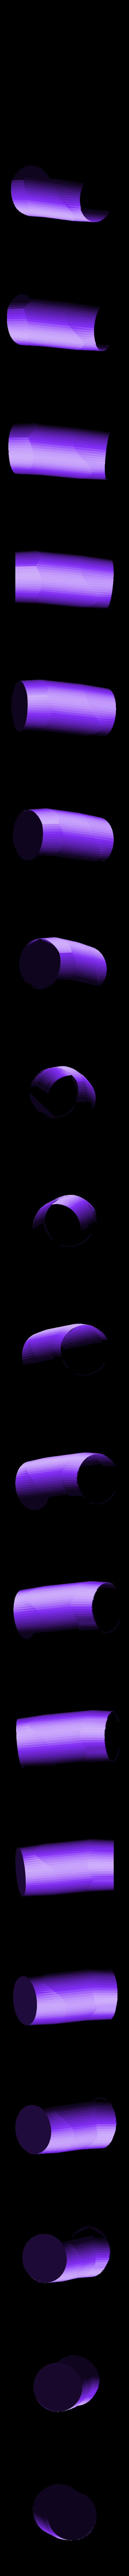 arm_left.stl Download free STL file Princess Peach from Mario games - multi-color • 3D print design, bpitanga